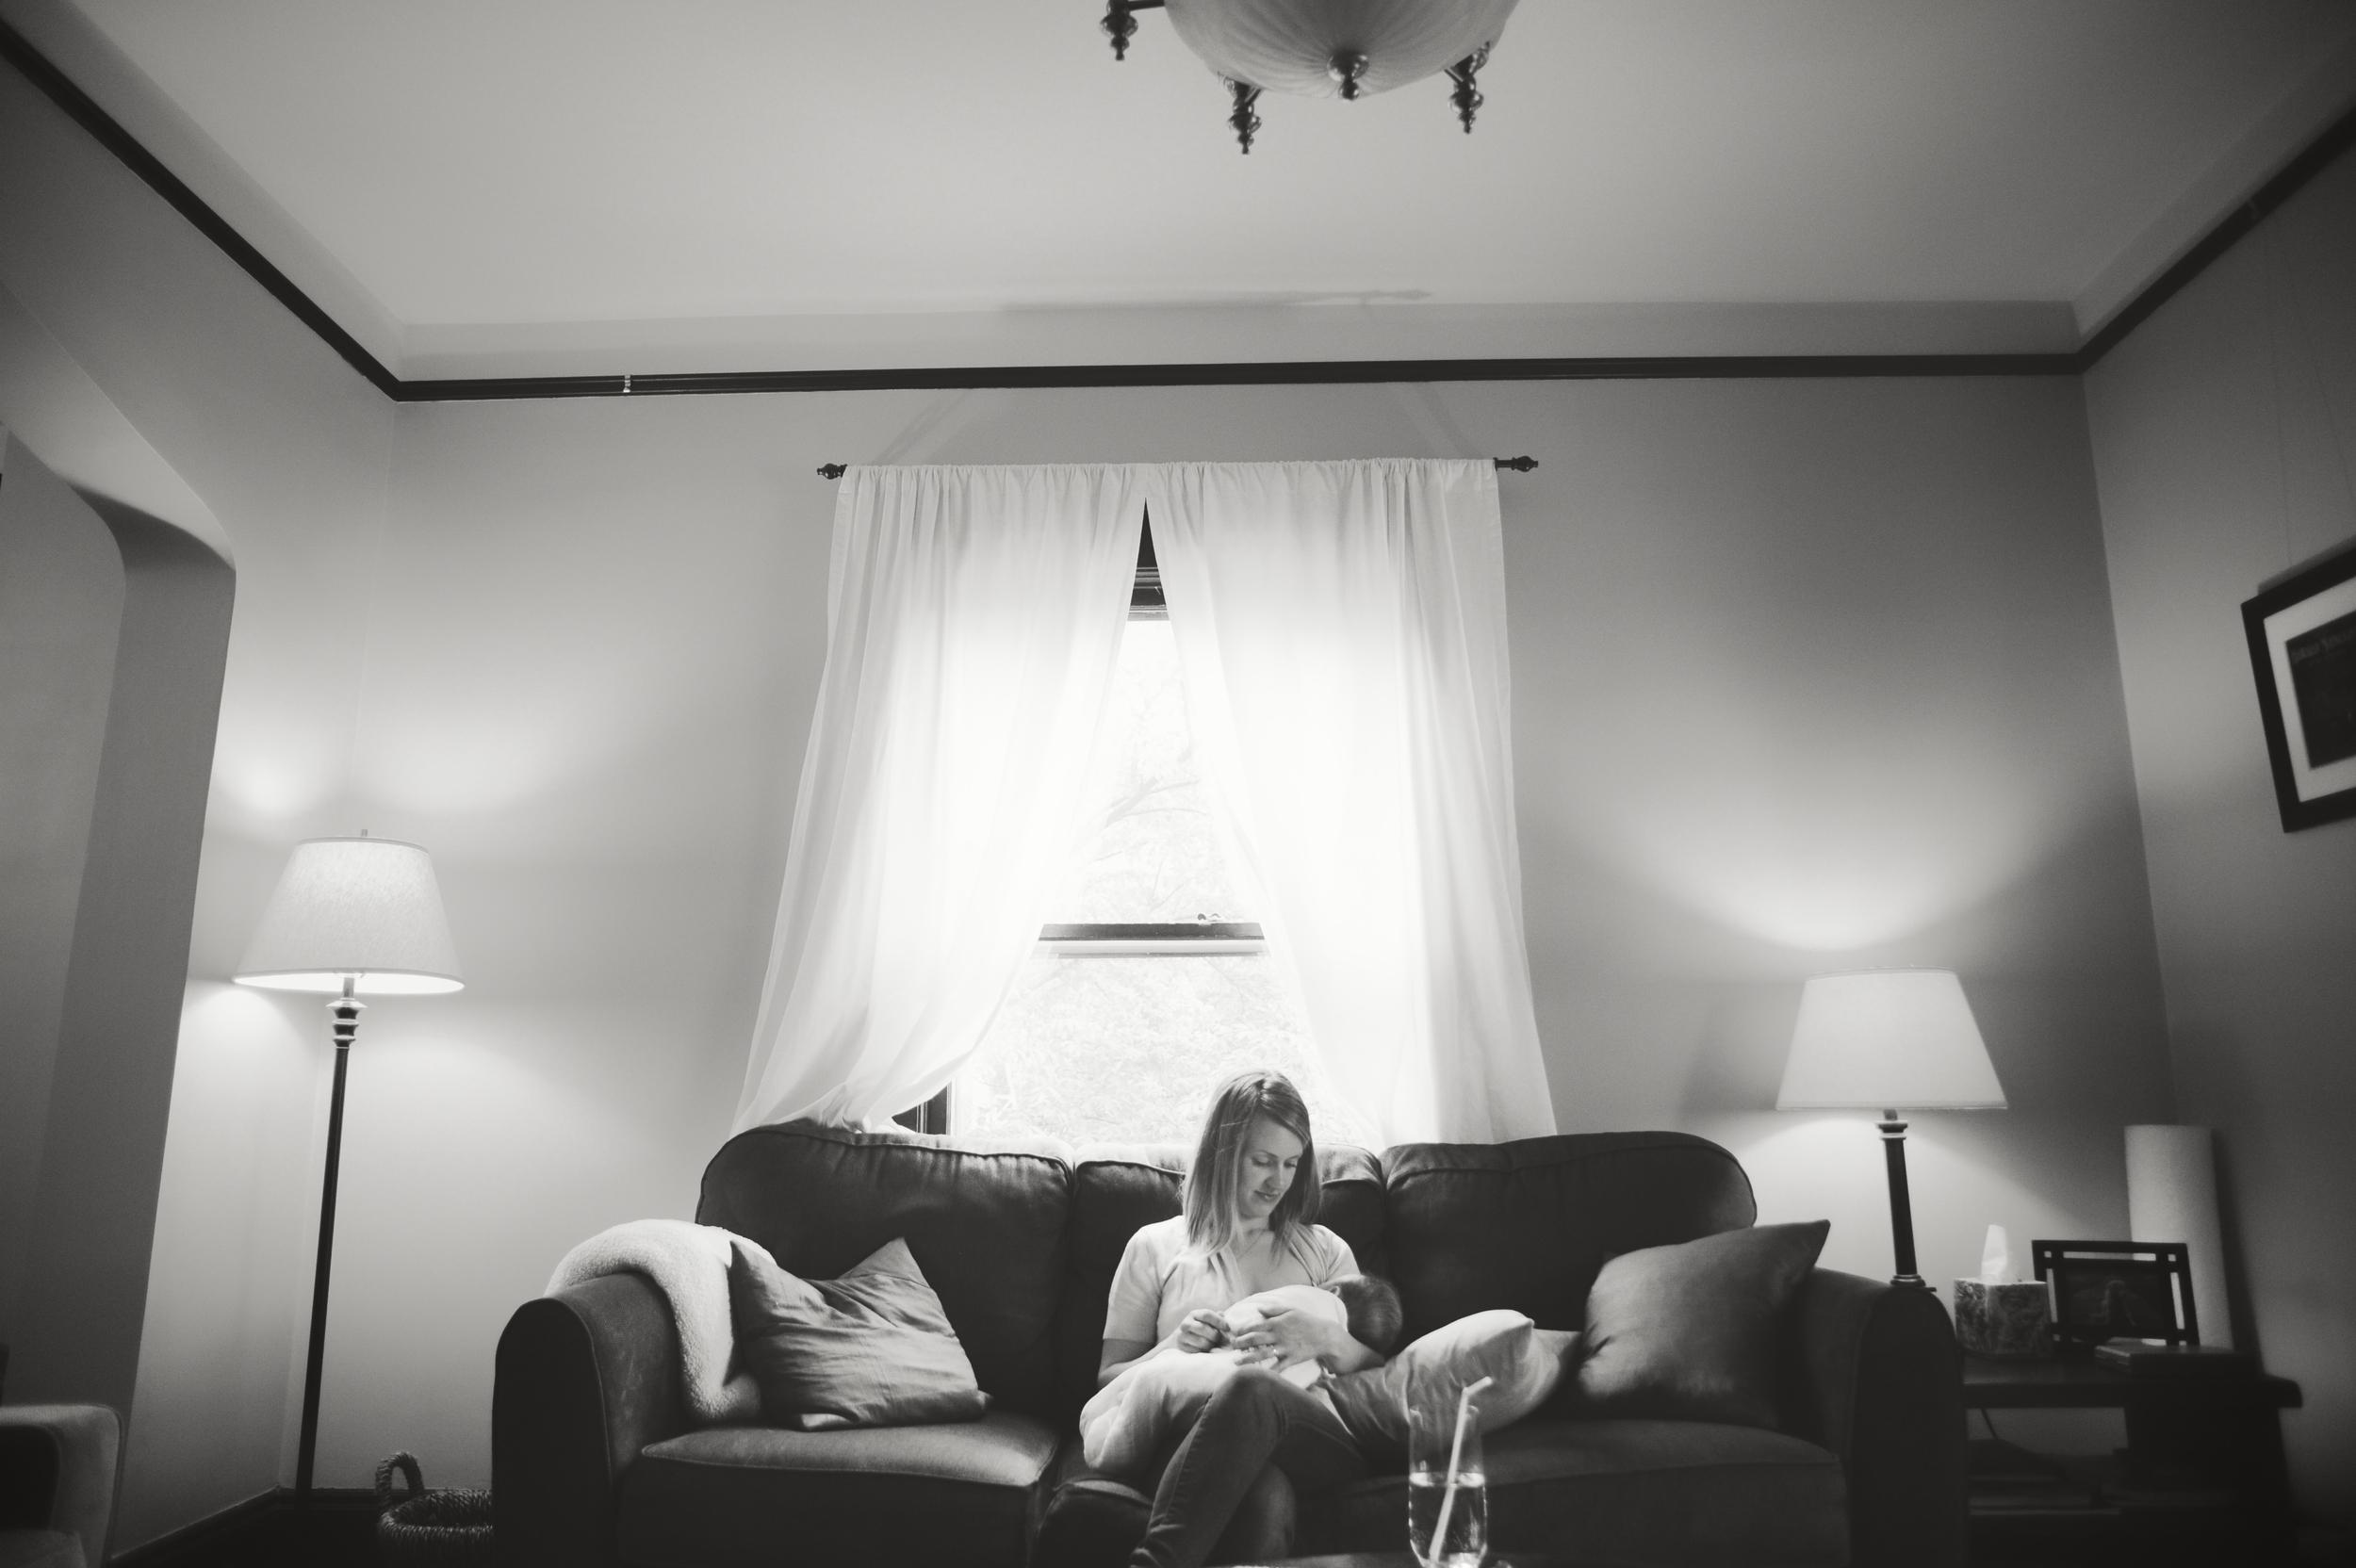 laurenlphotography(motherhood) (6).jpg